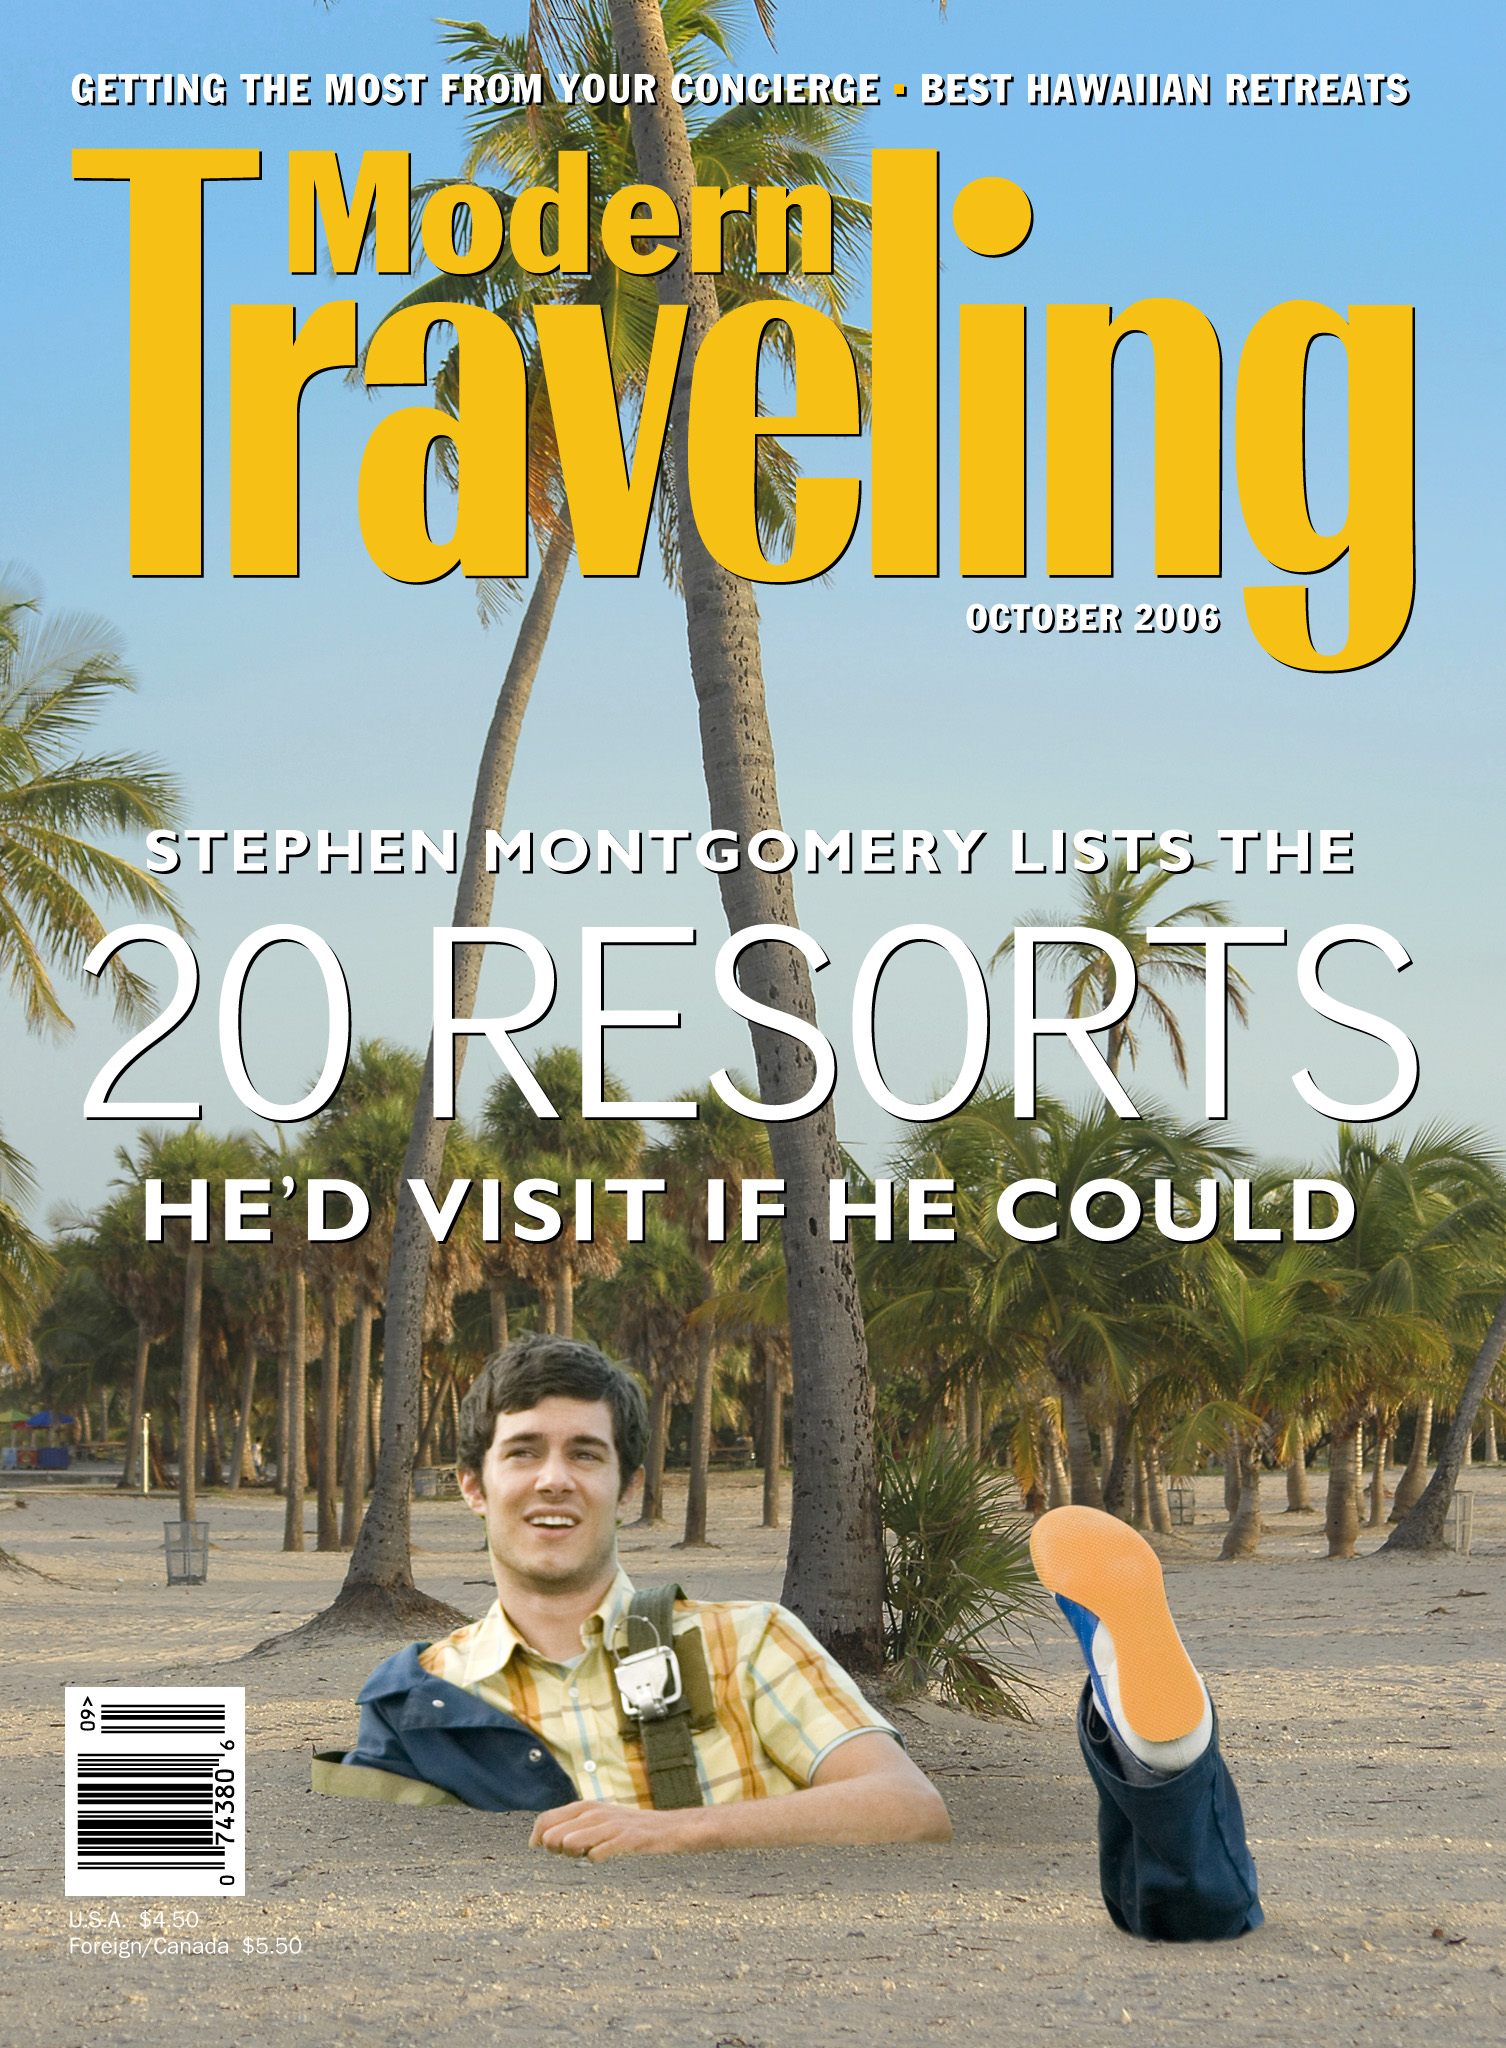 The Ten/magazine cover